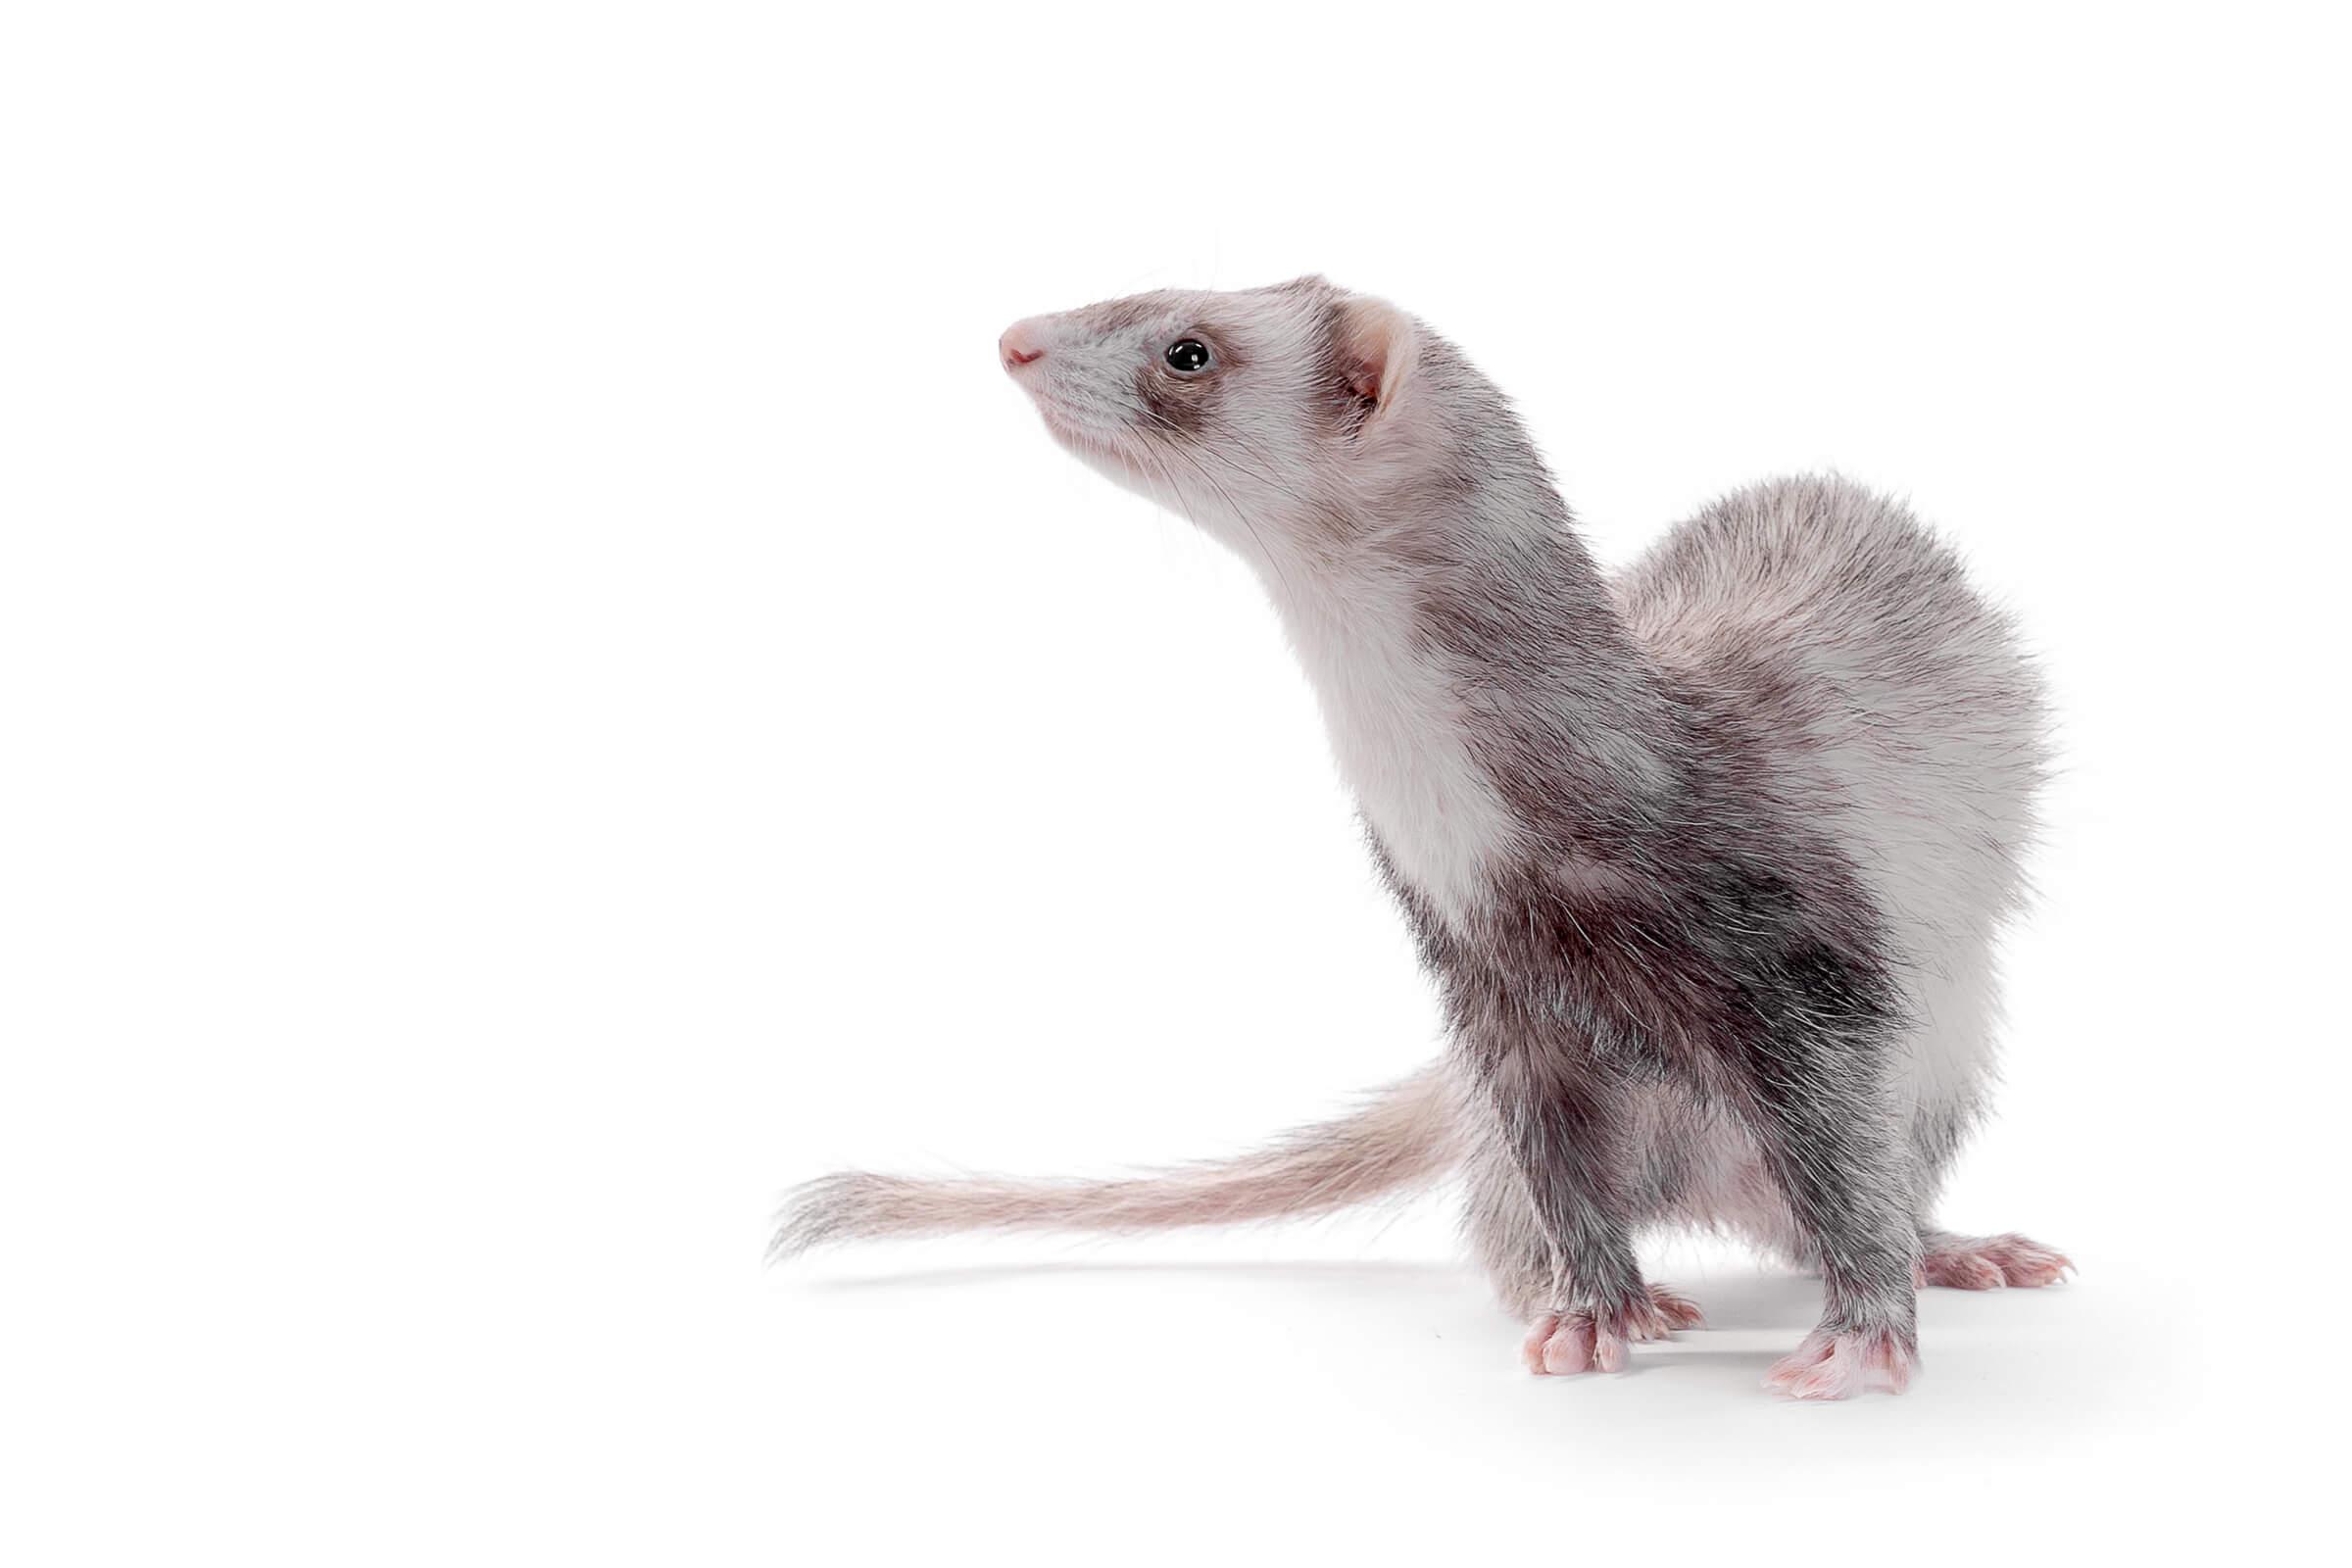 side profile of ferret on white background